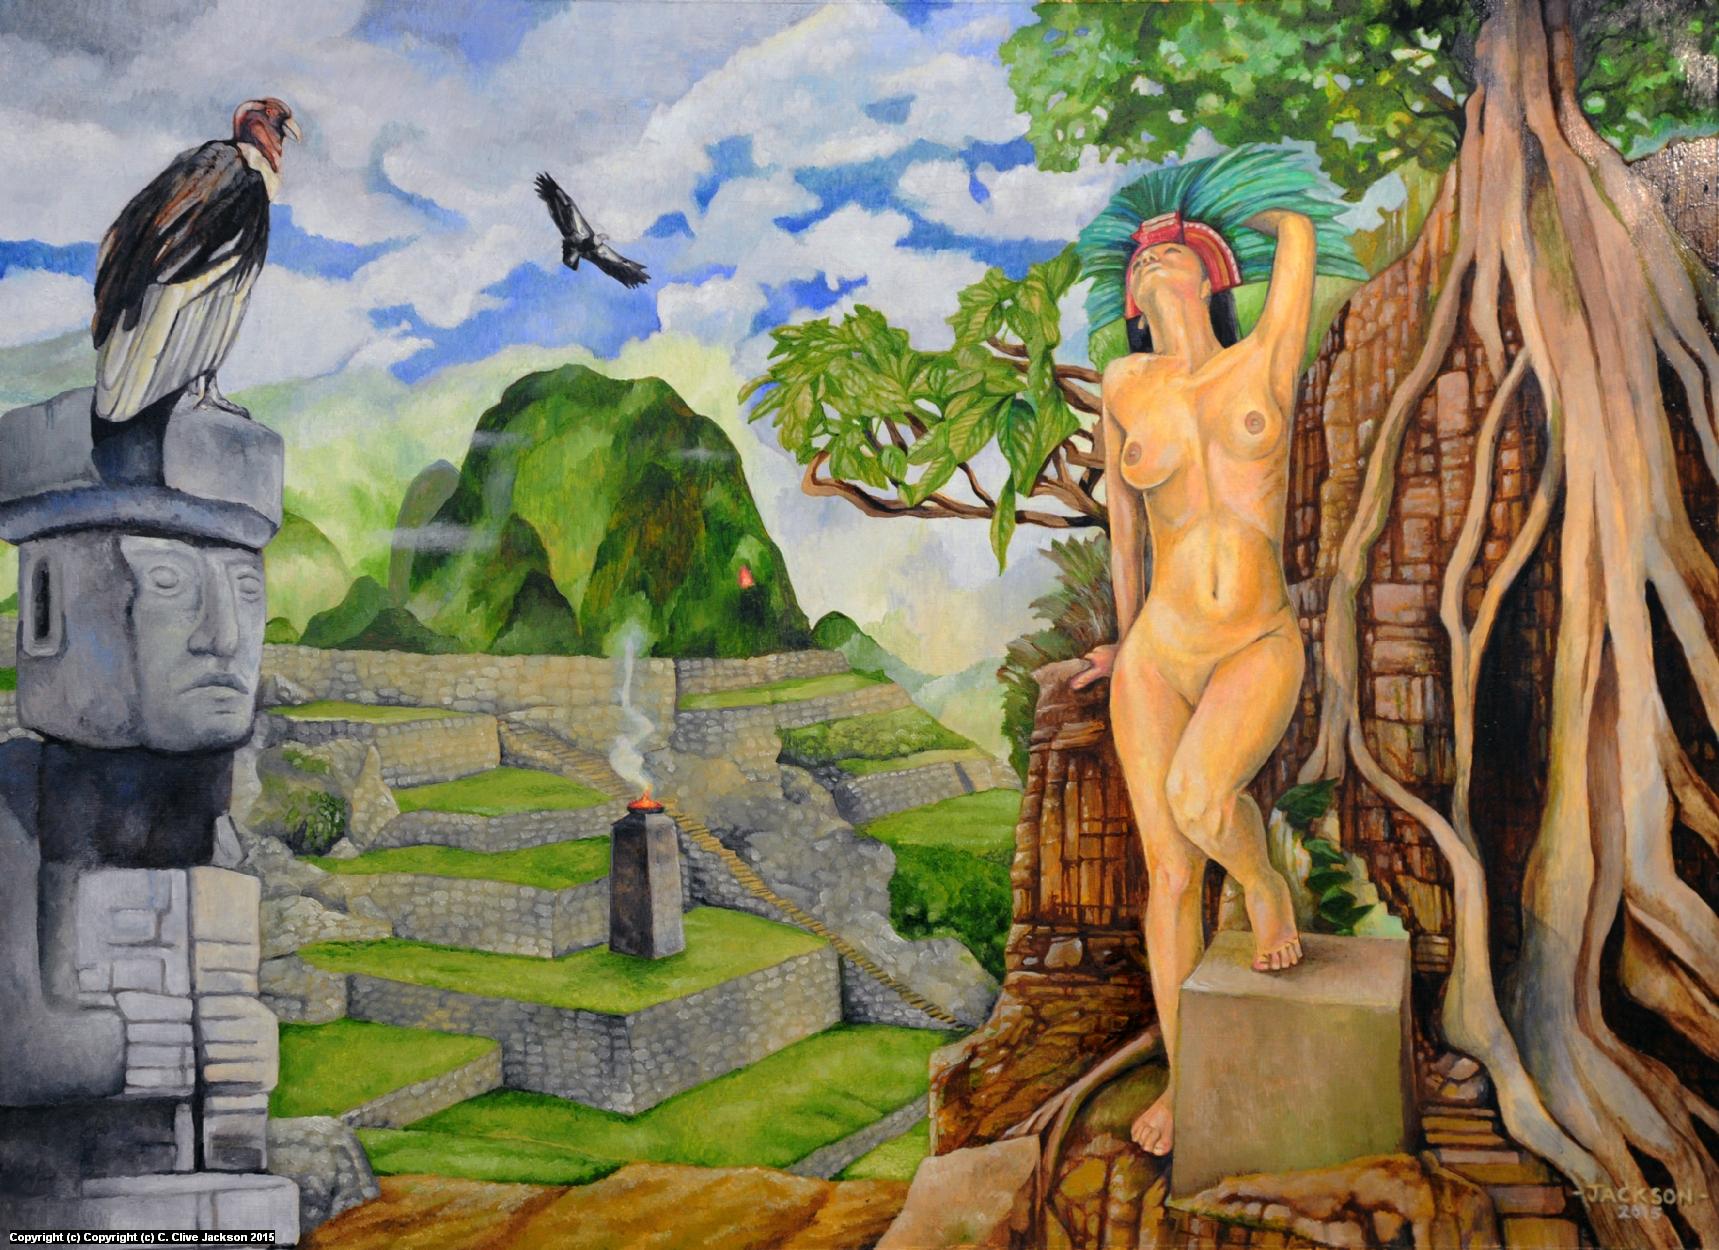 Incan Priestess Artwork by Colin Clive Jackson